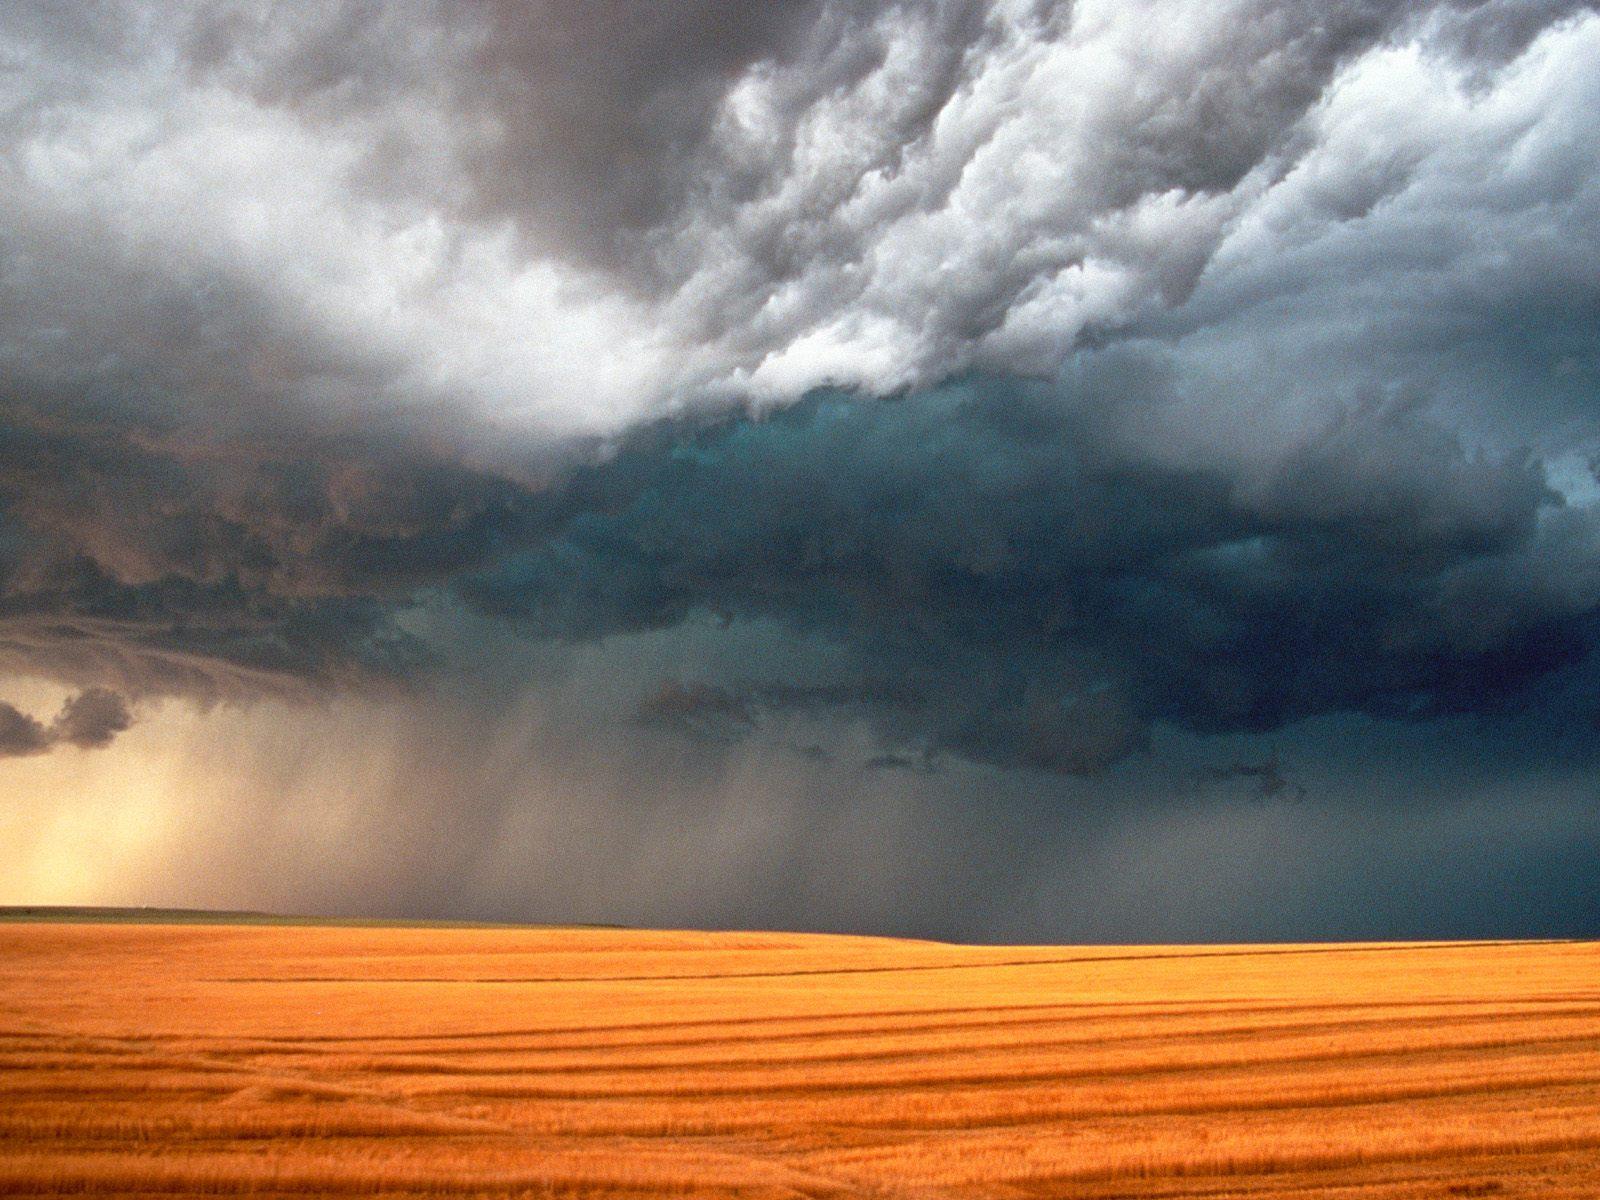 Desktop Wallpaper Gallery Nature Storm Watch Free 1600x1200px